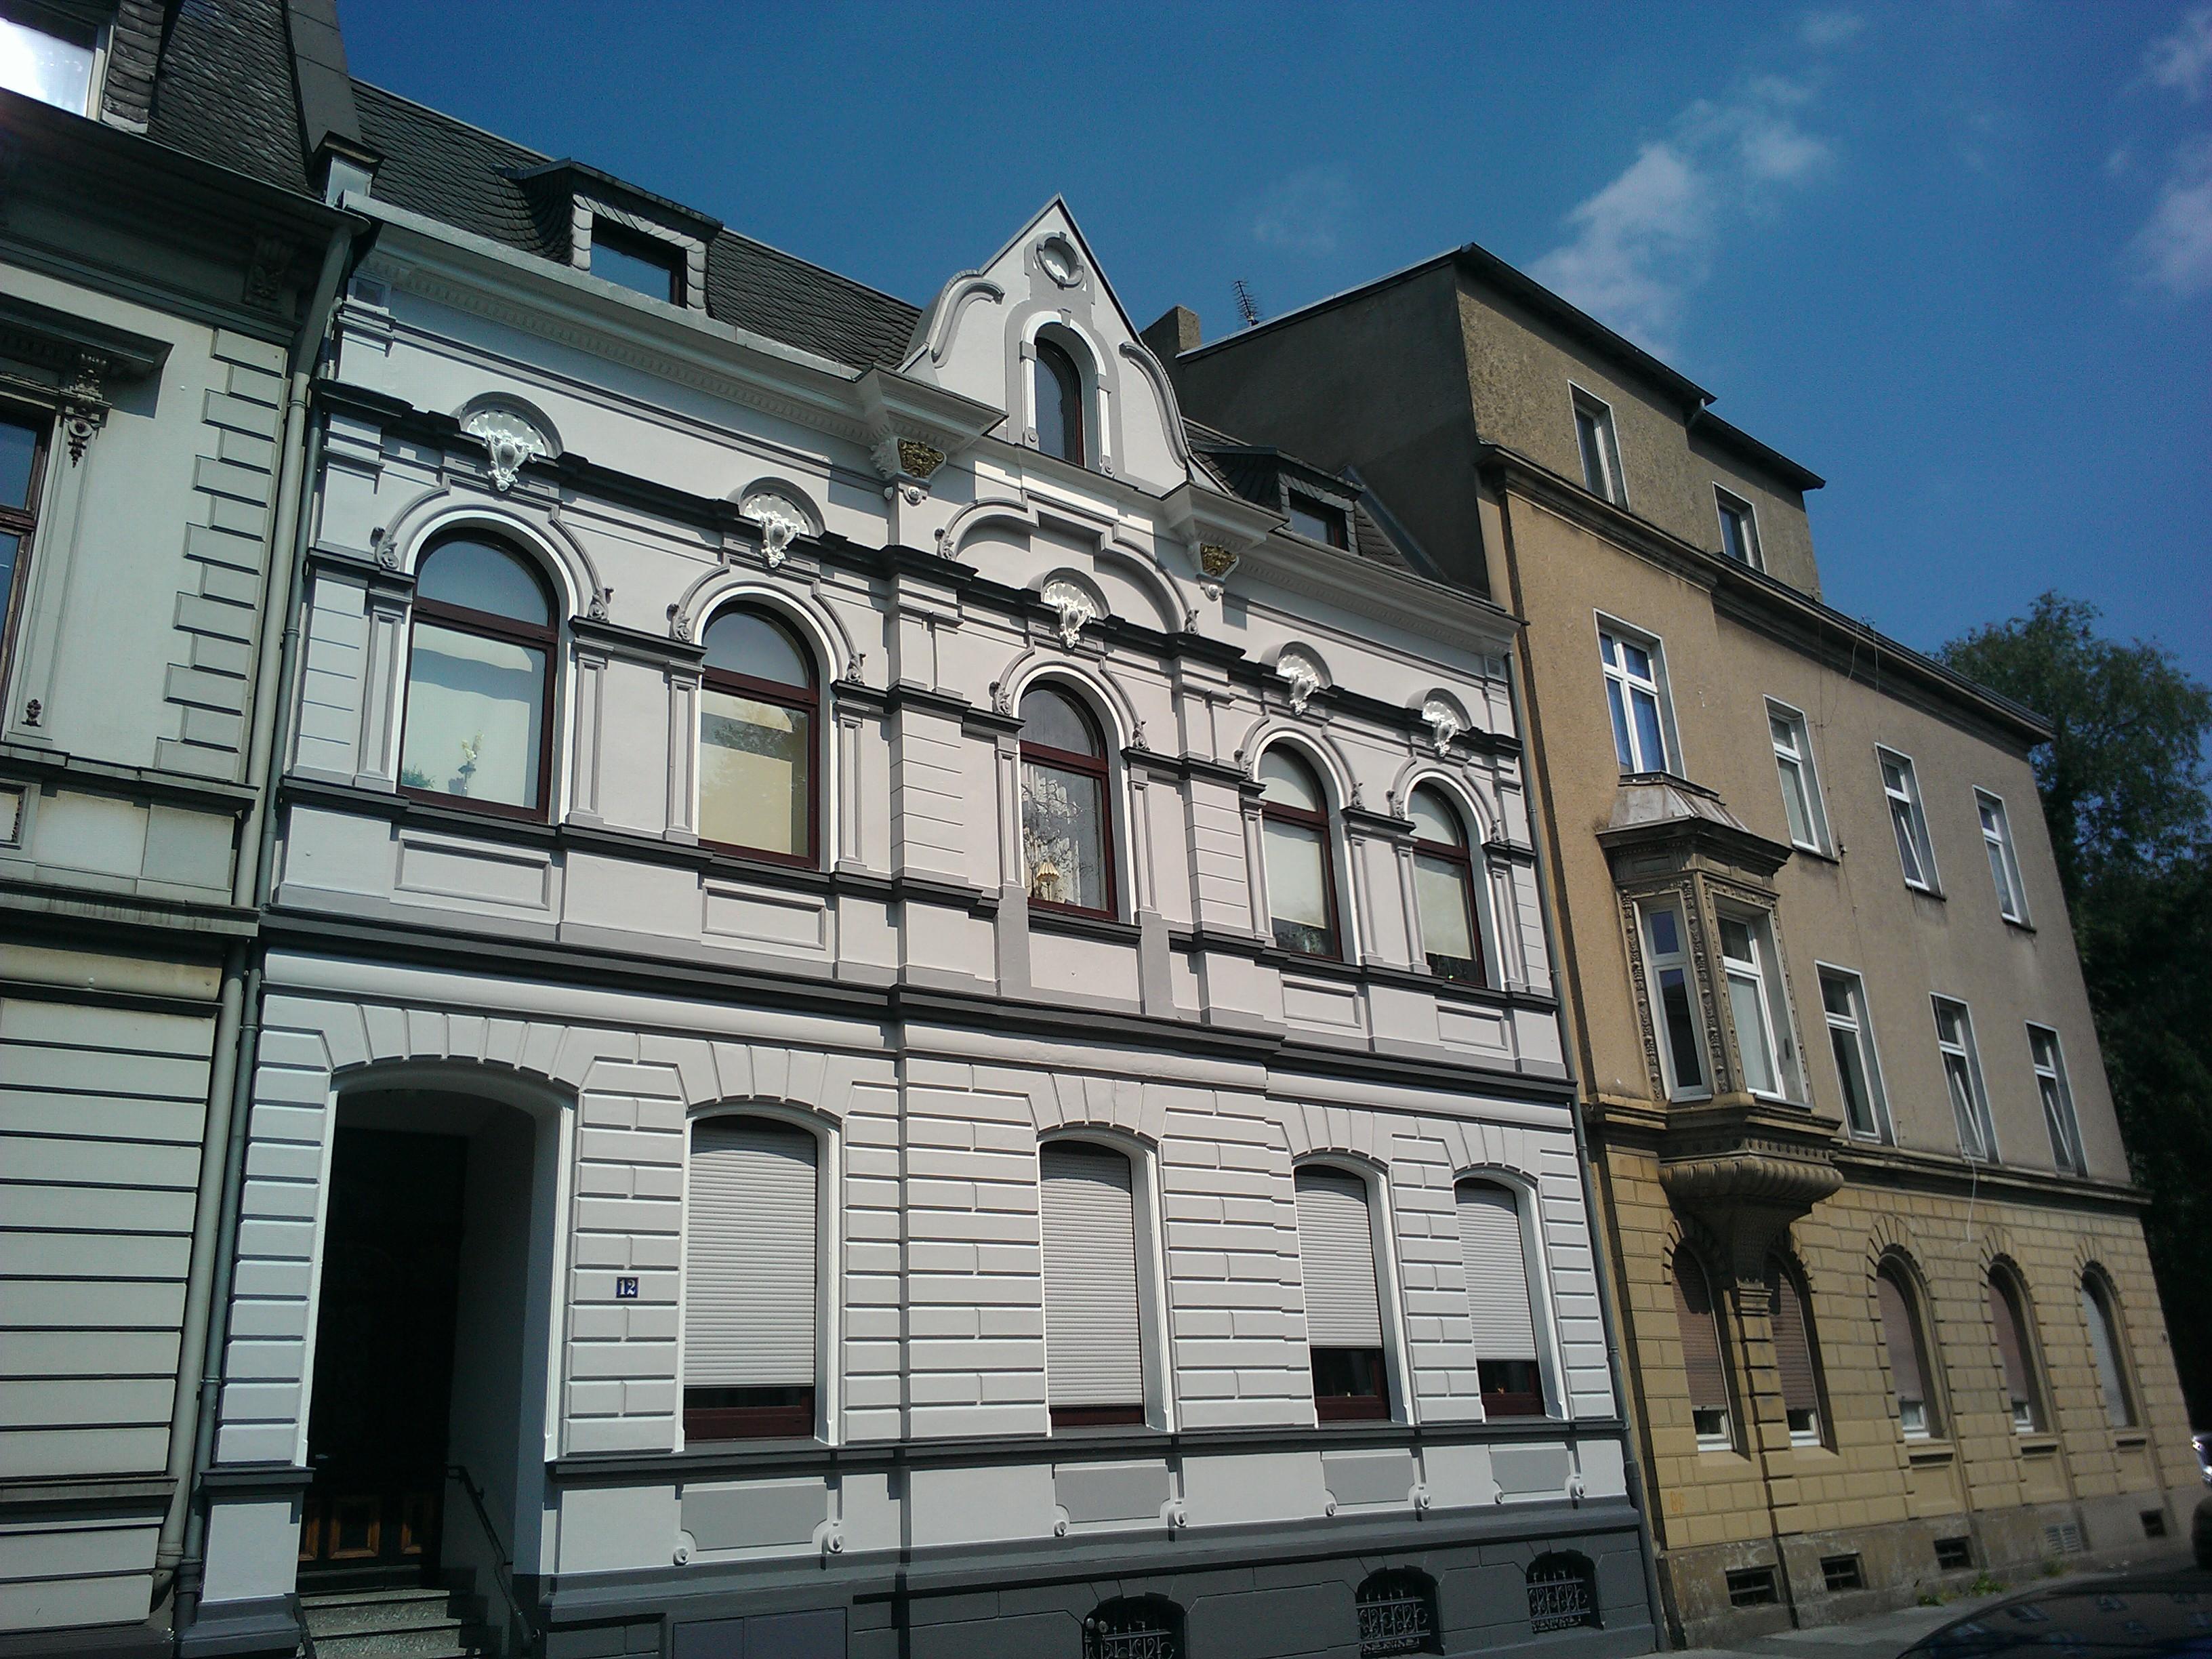 http://www.wiederholds.de/wpnordstrasse/wp-content/uploads/nordstrasse12.jpg